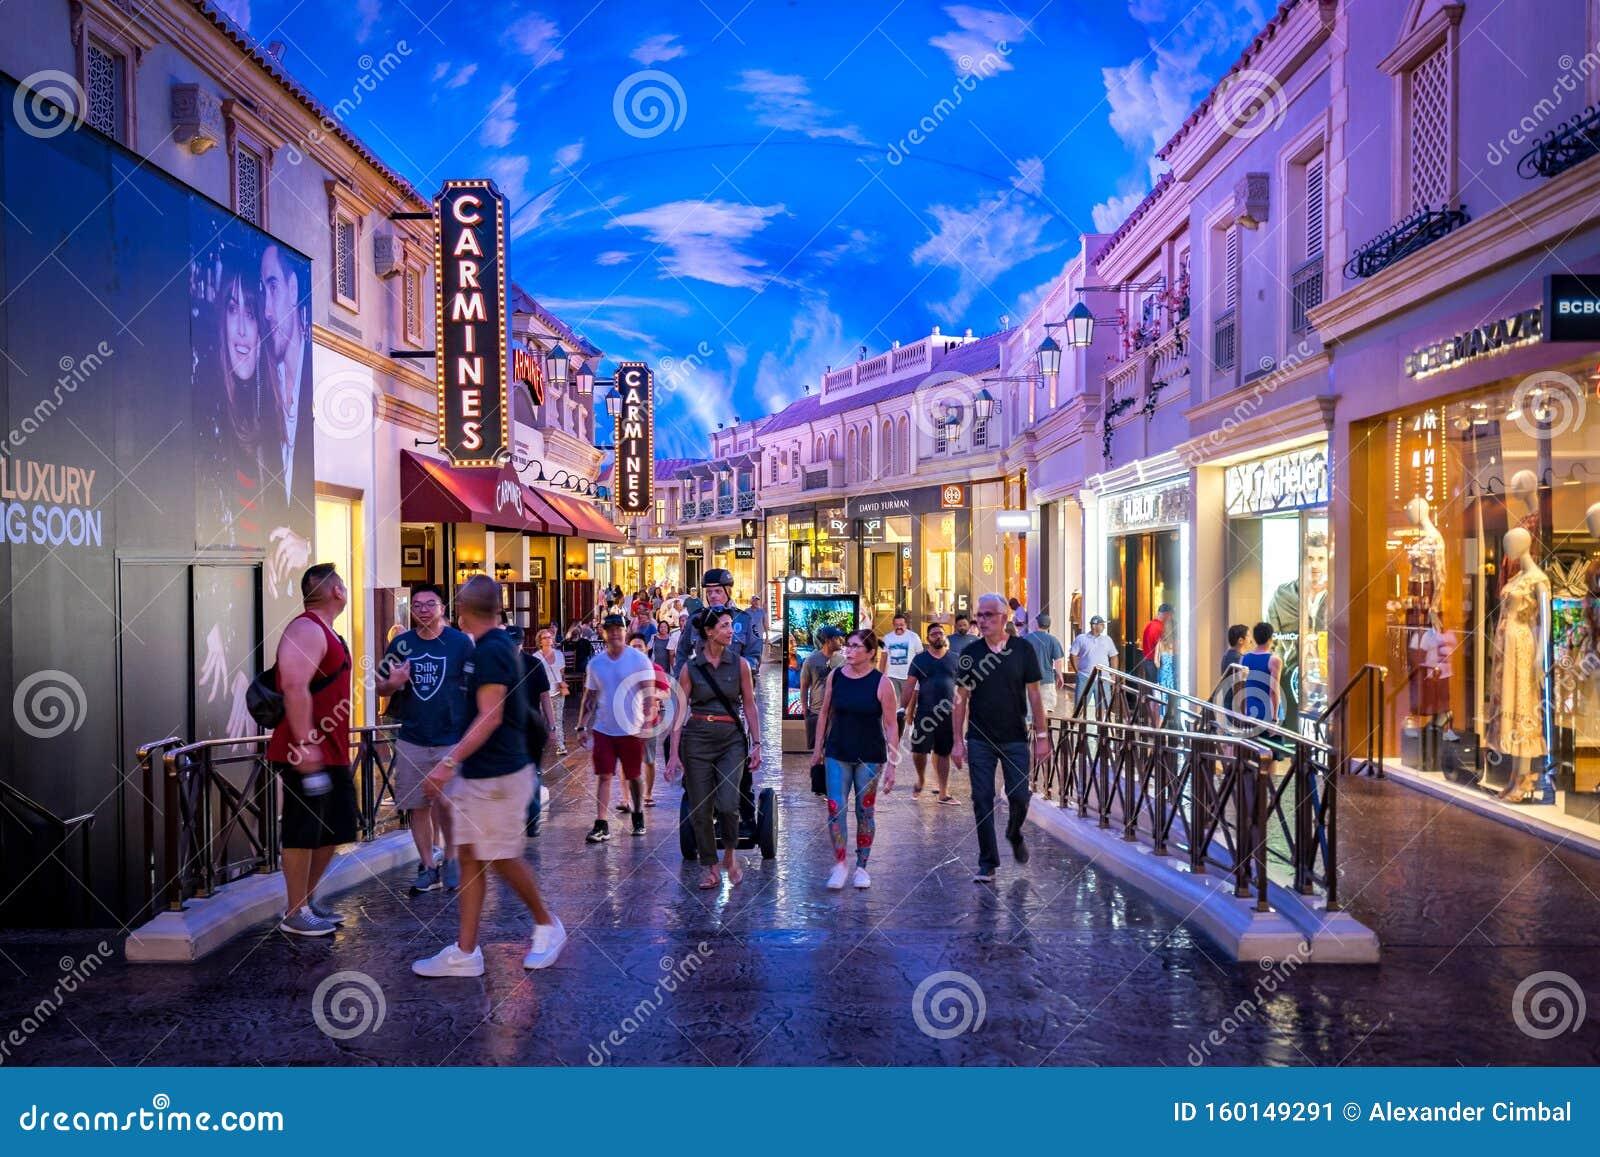 Las Vegas Nevada Usa Shopping Strip Inside The Caesars Palace